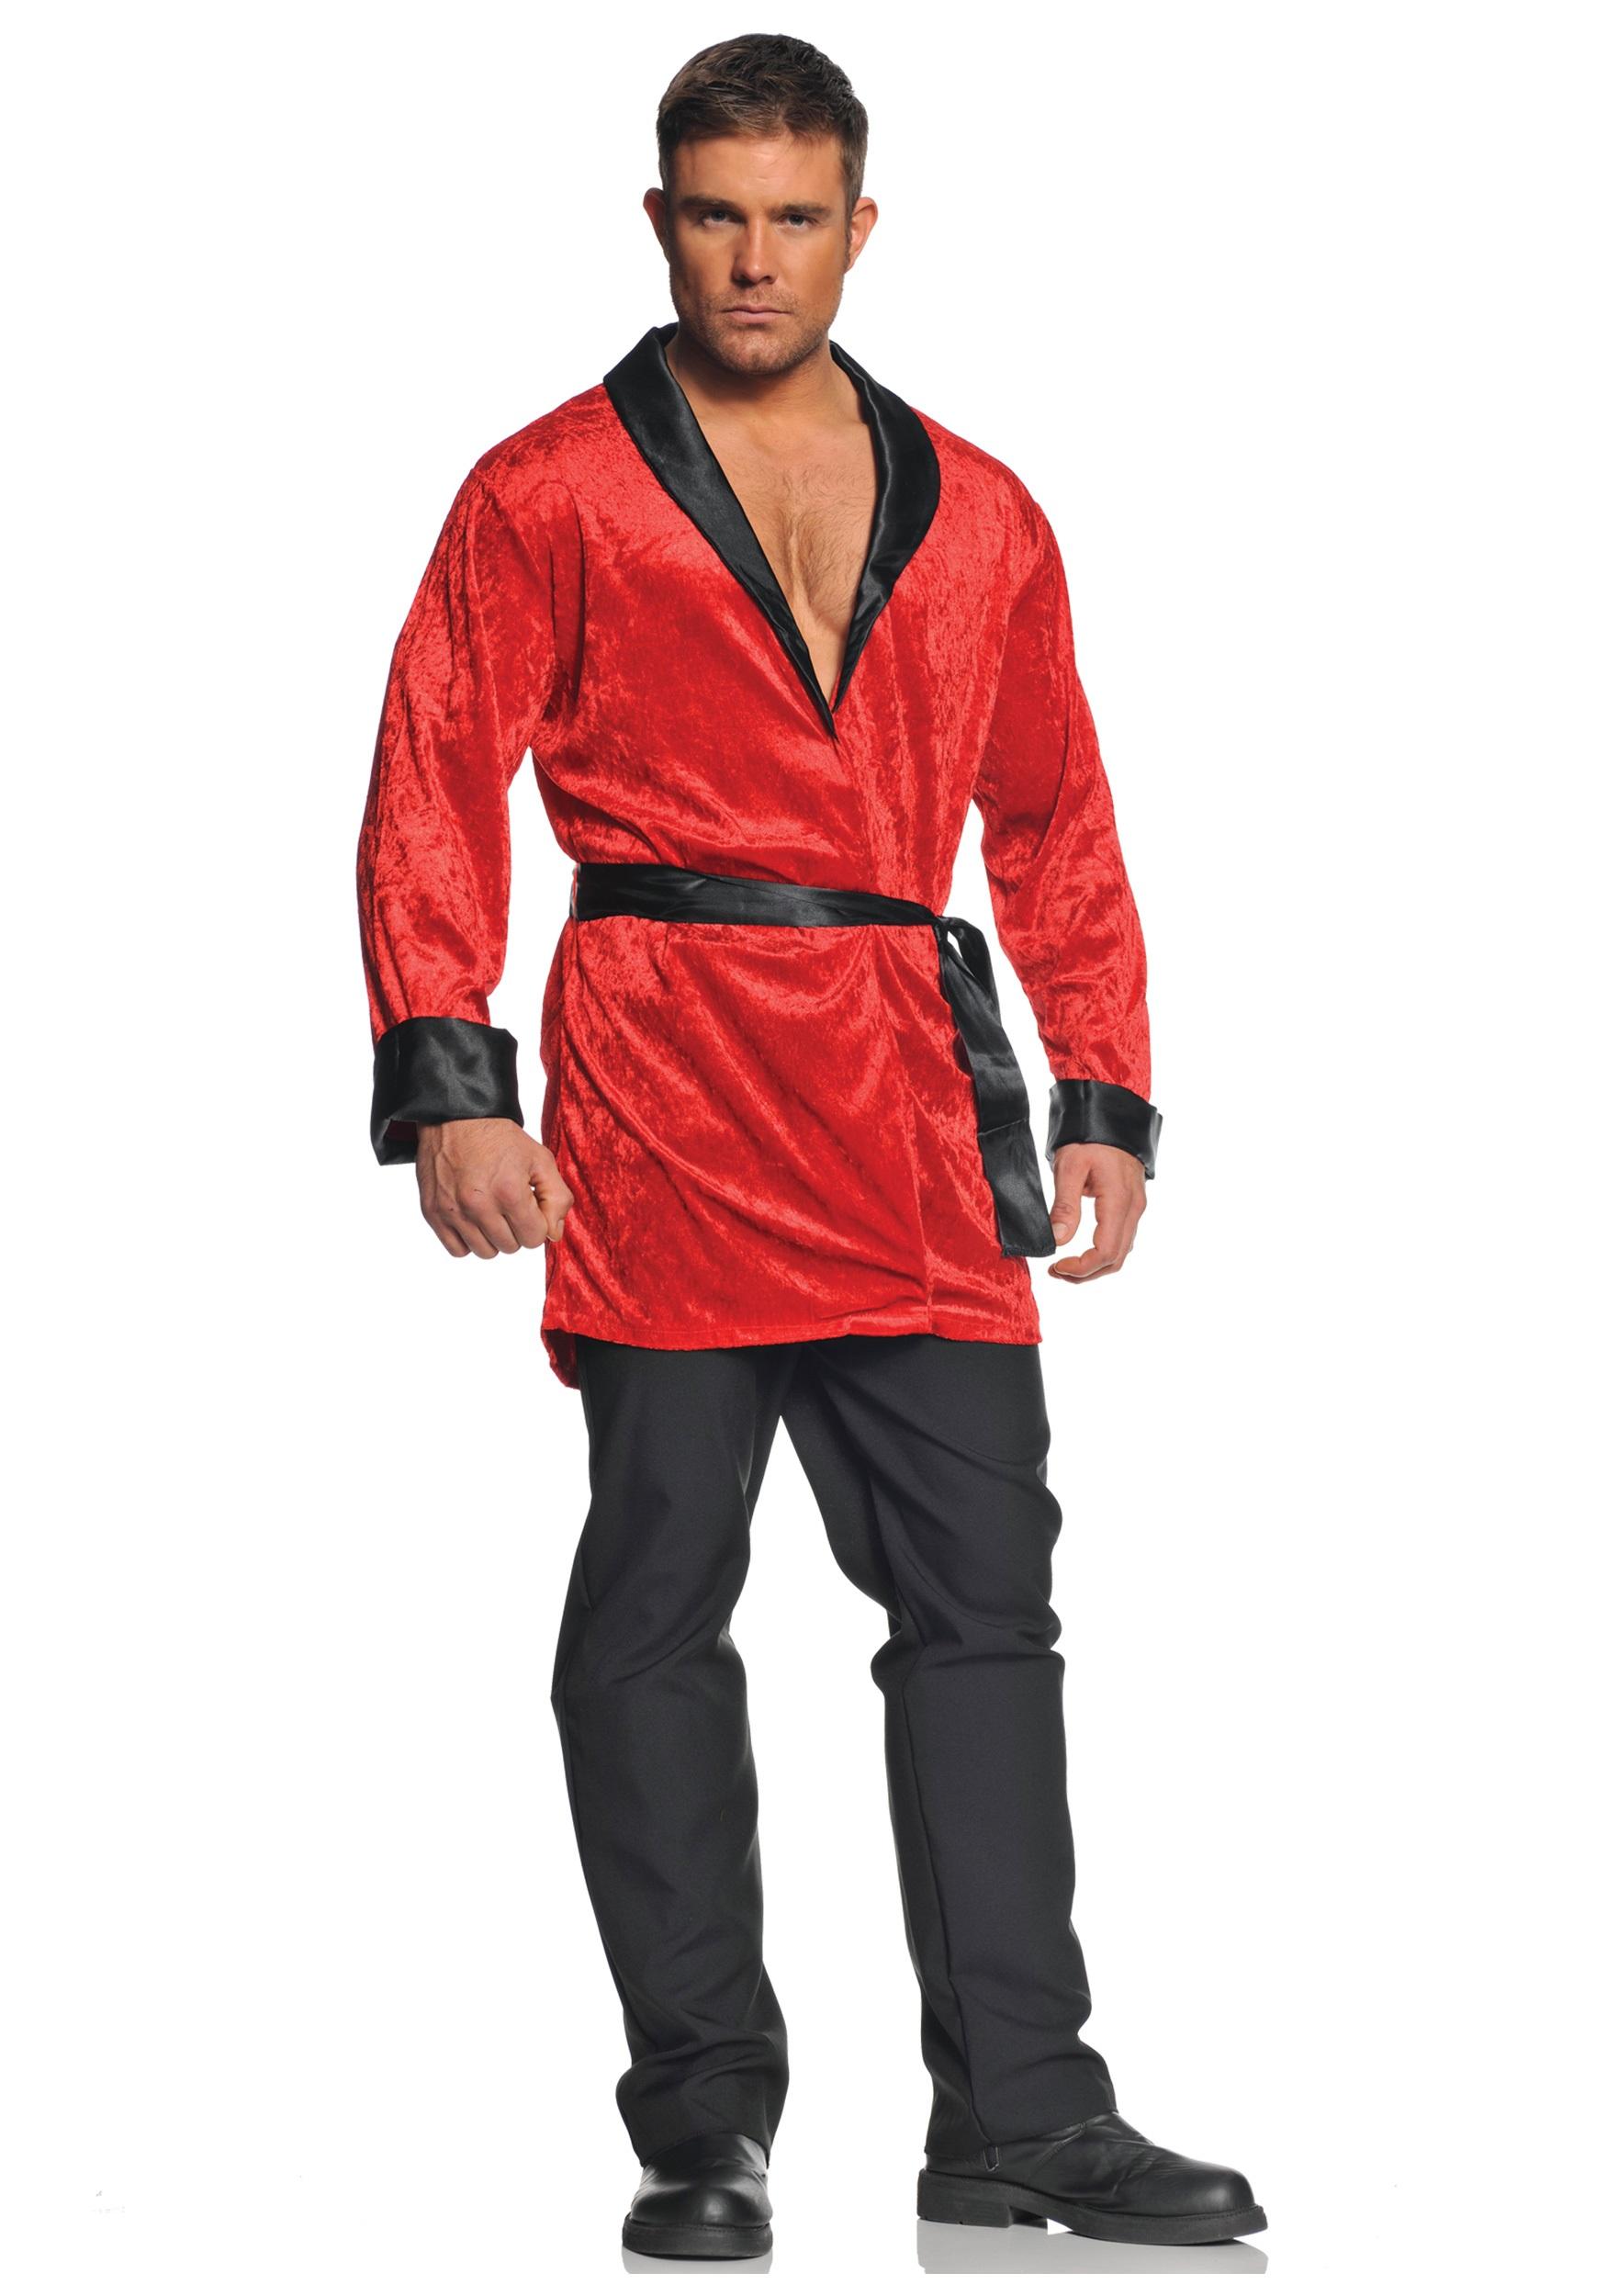 Smoking Jacket Costume | Hugh Hefner Costume